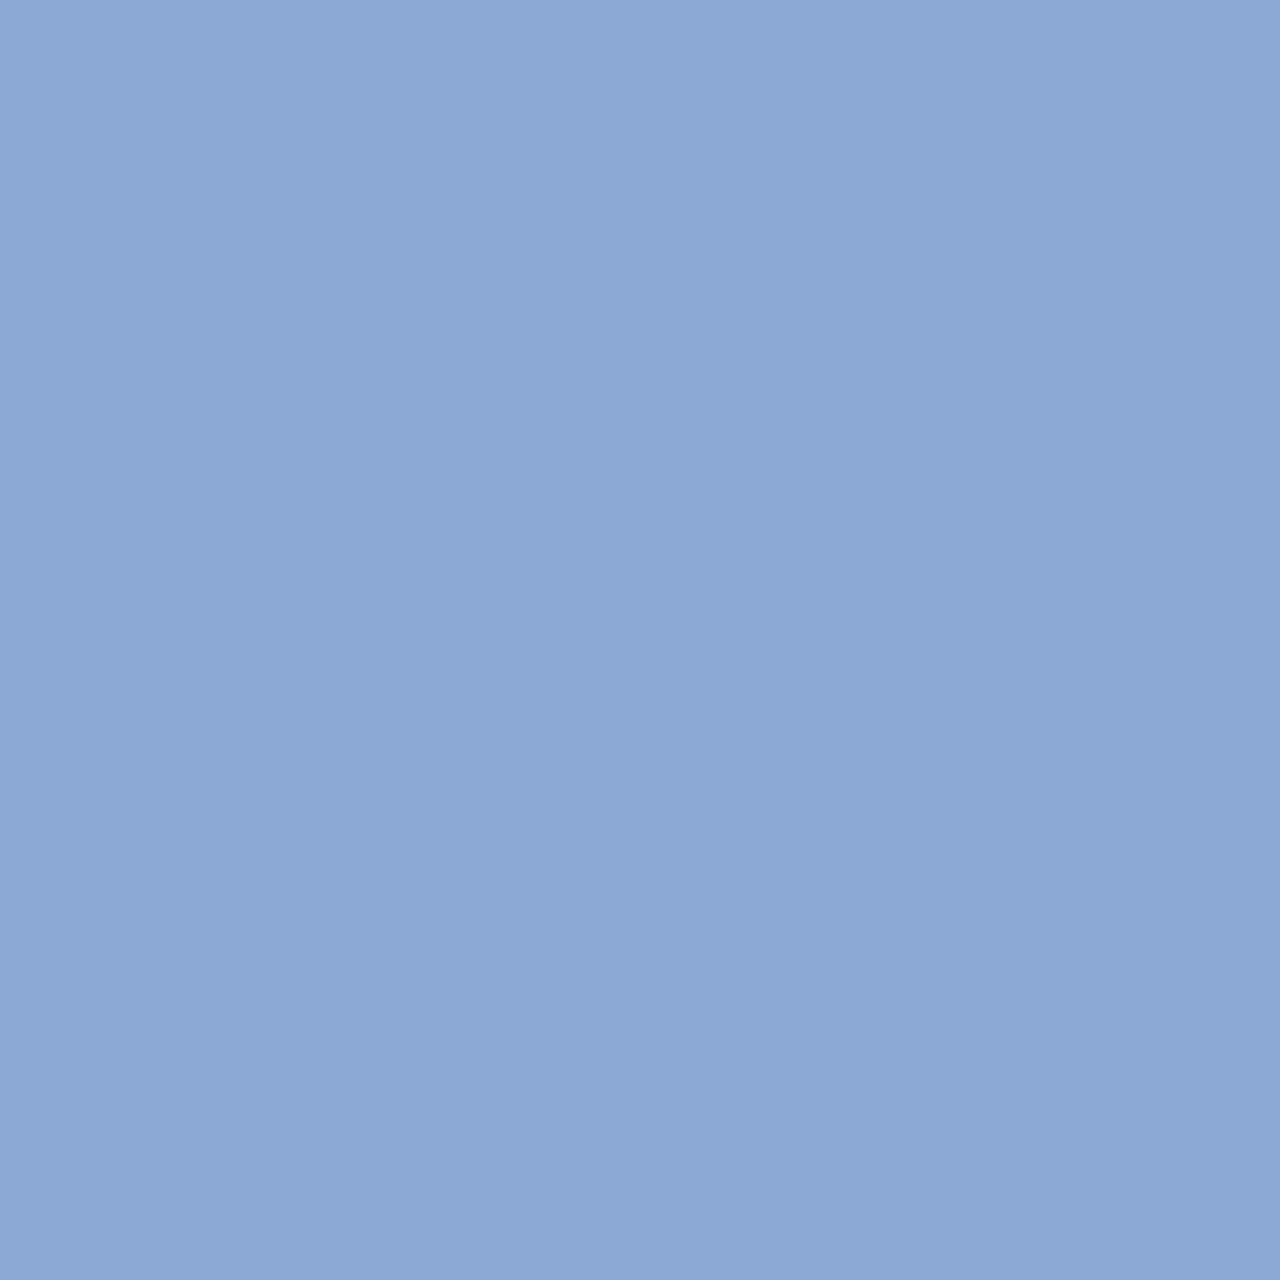 "#3203 Rosco Gels Roscolux Three Quarter Blue CTB, 20x24"""